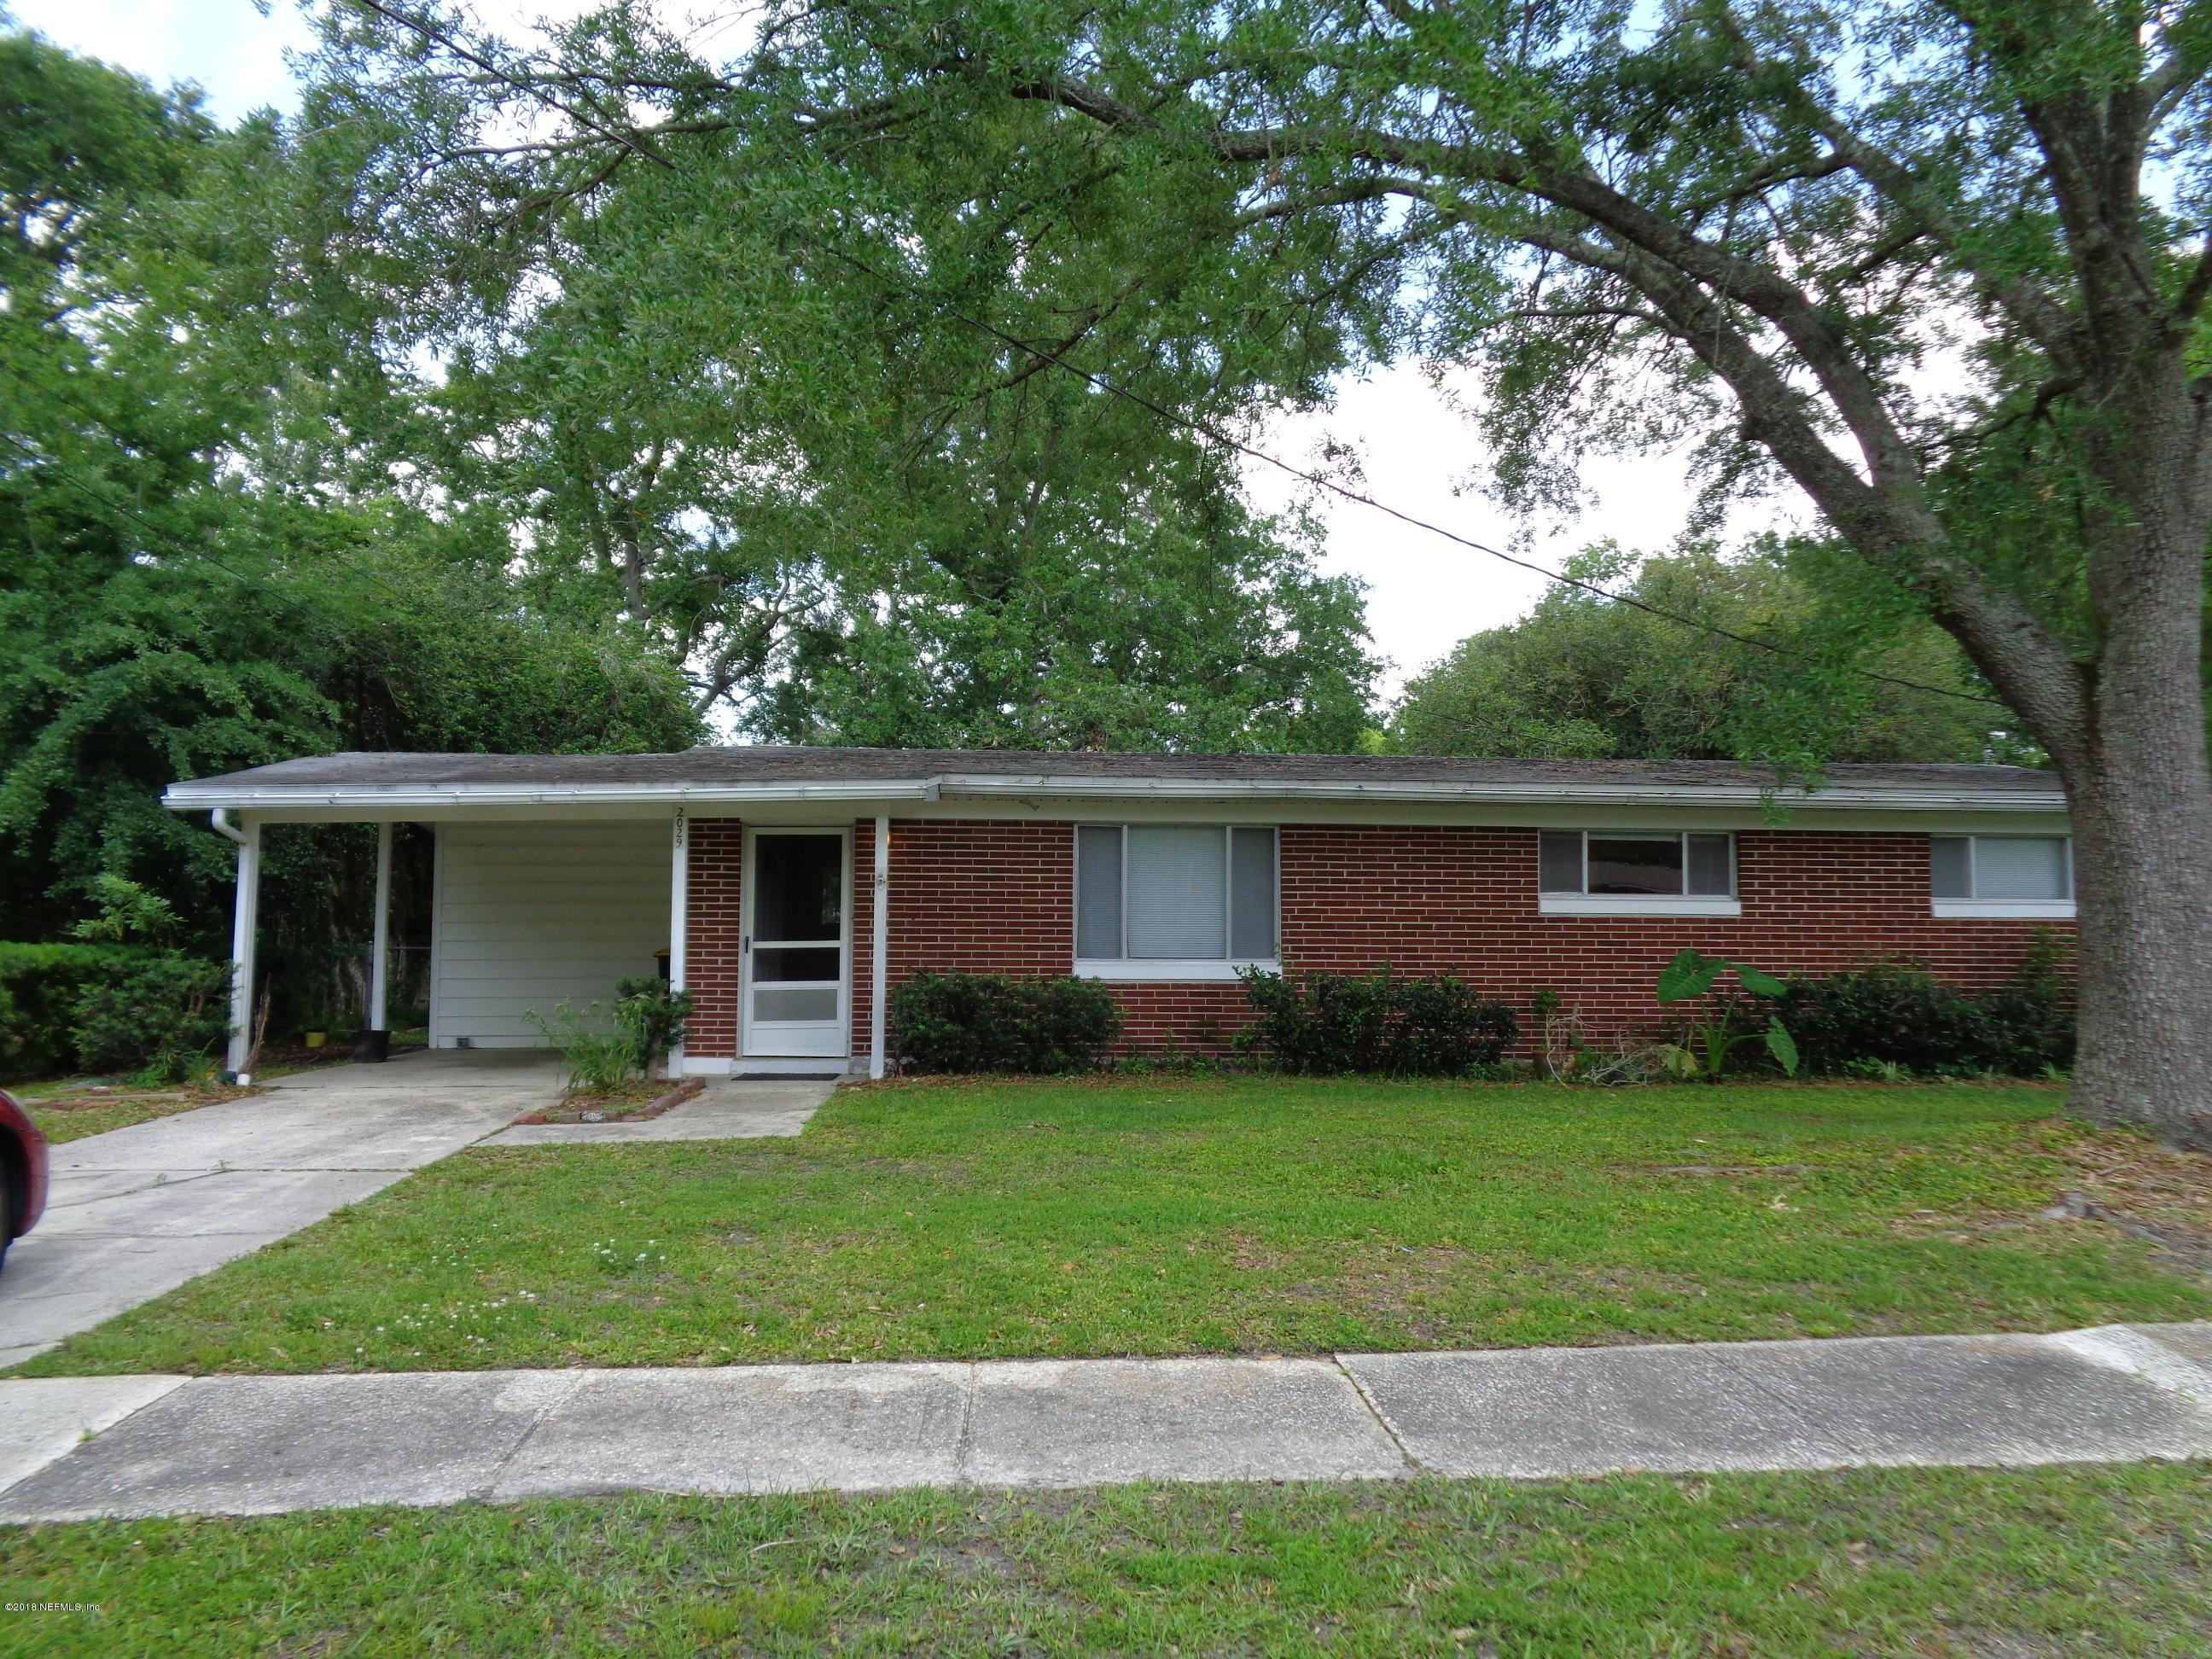 2029 BURPEE, JACKSONVILLE, FLORIDA 32210, 3 Bedrooms Bedrooms, ,2 BathroomsBathrooms,Residential - single family,For sale,BURPEE,933496